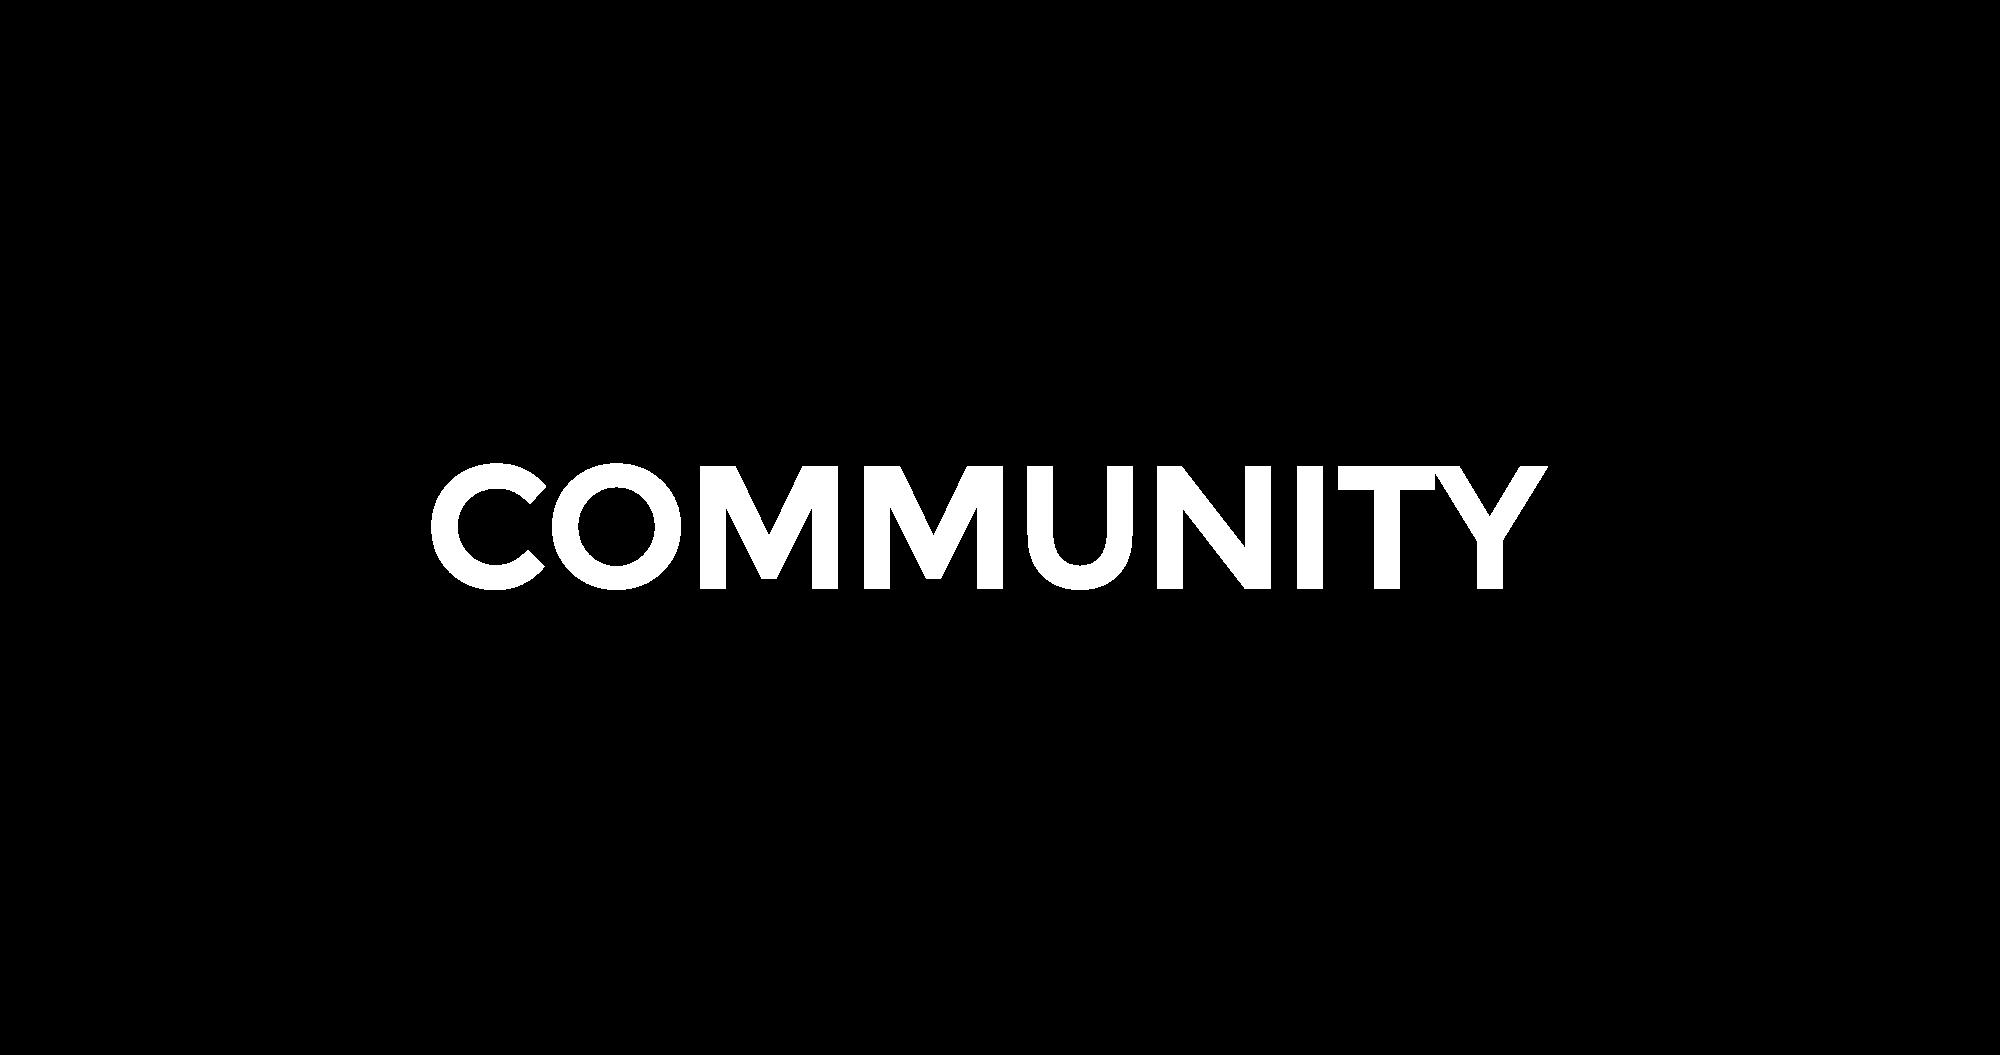 COMMUNITY-logo-white.png